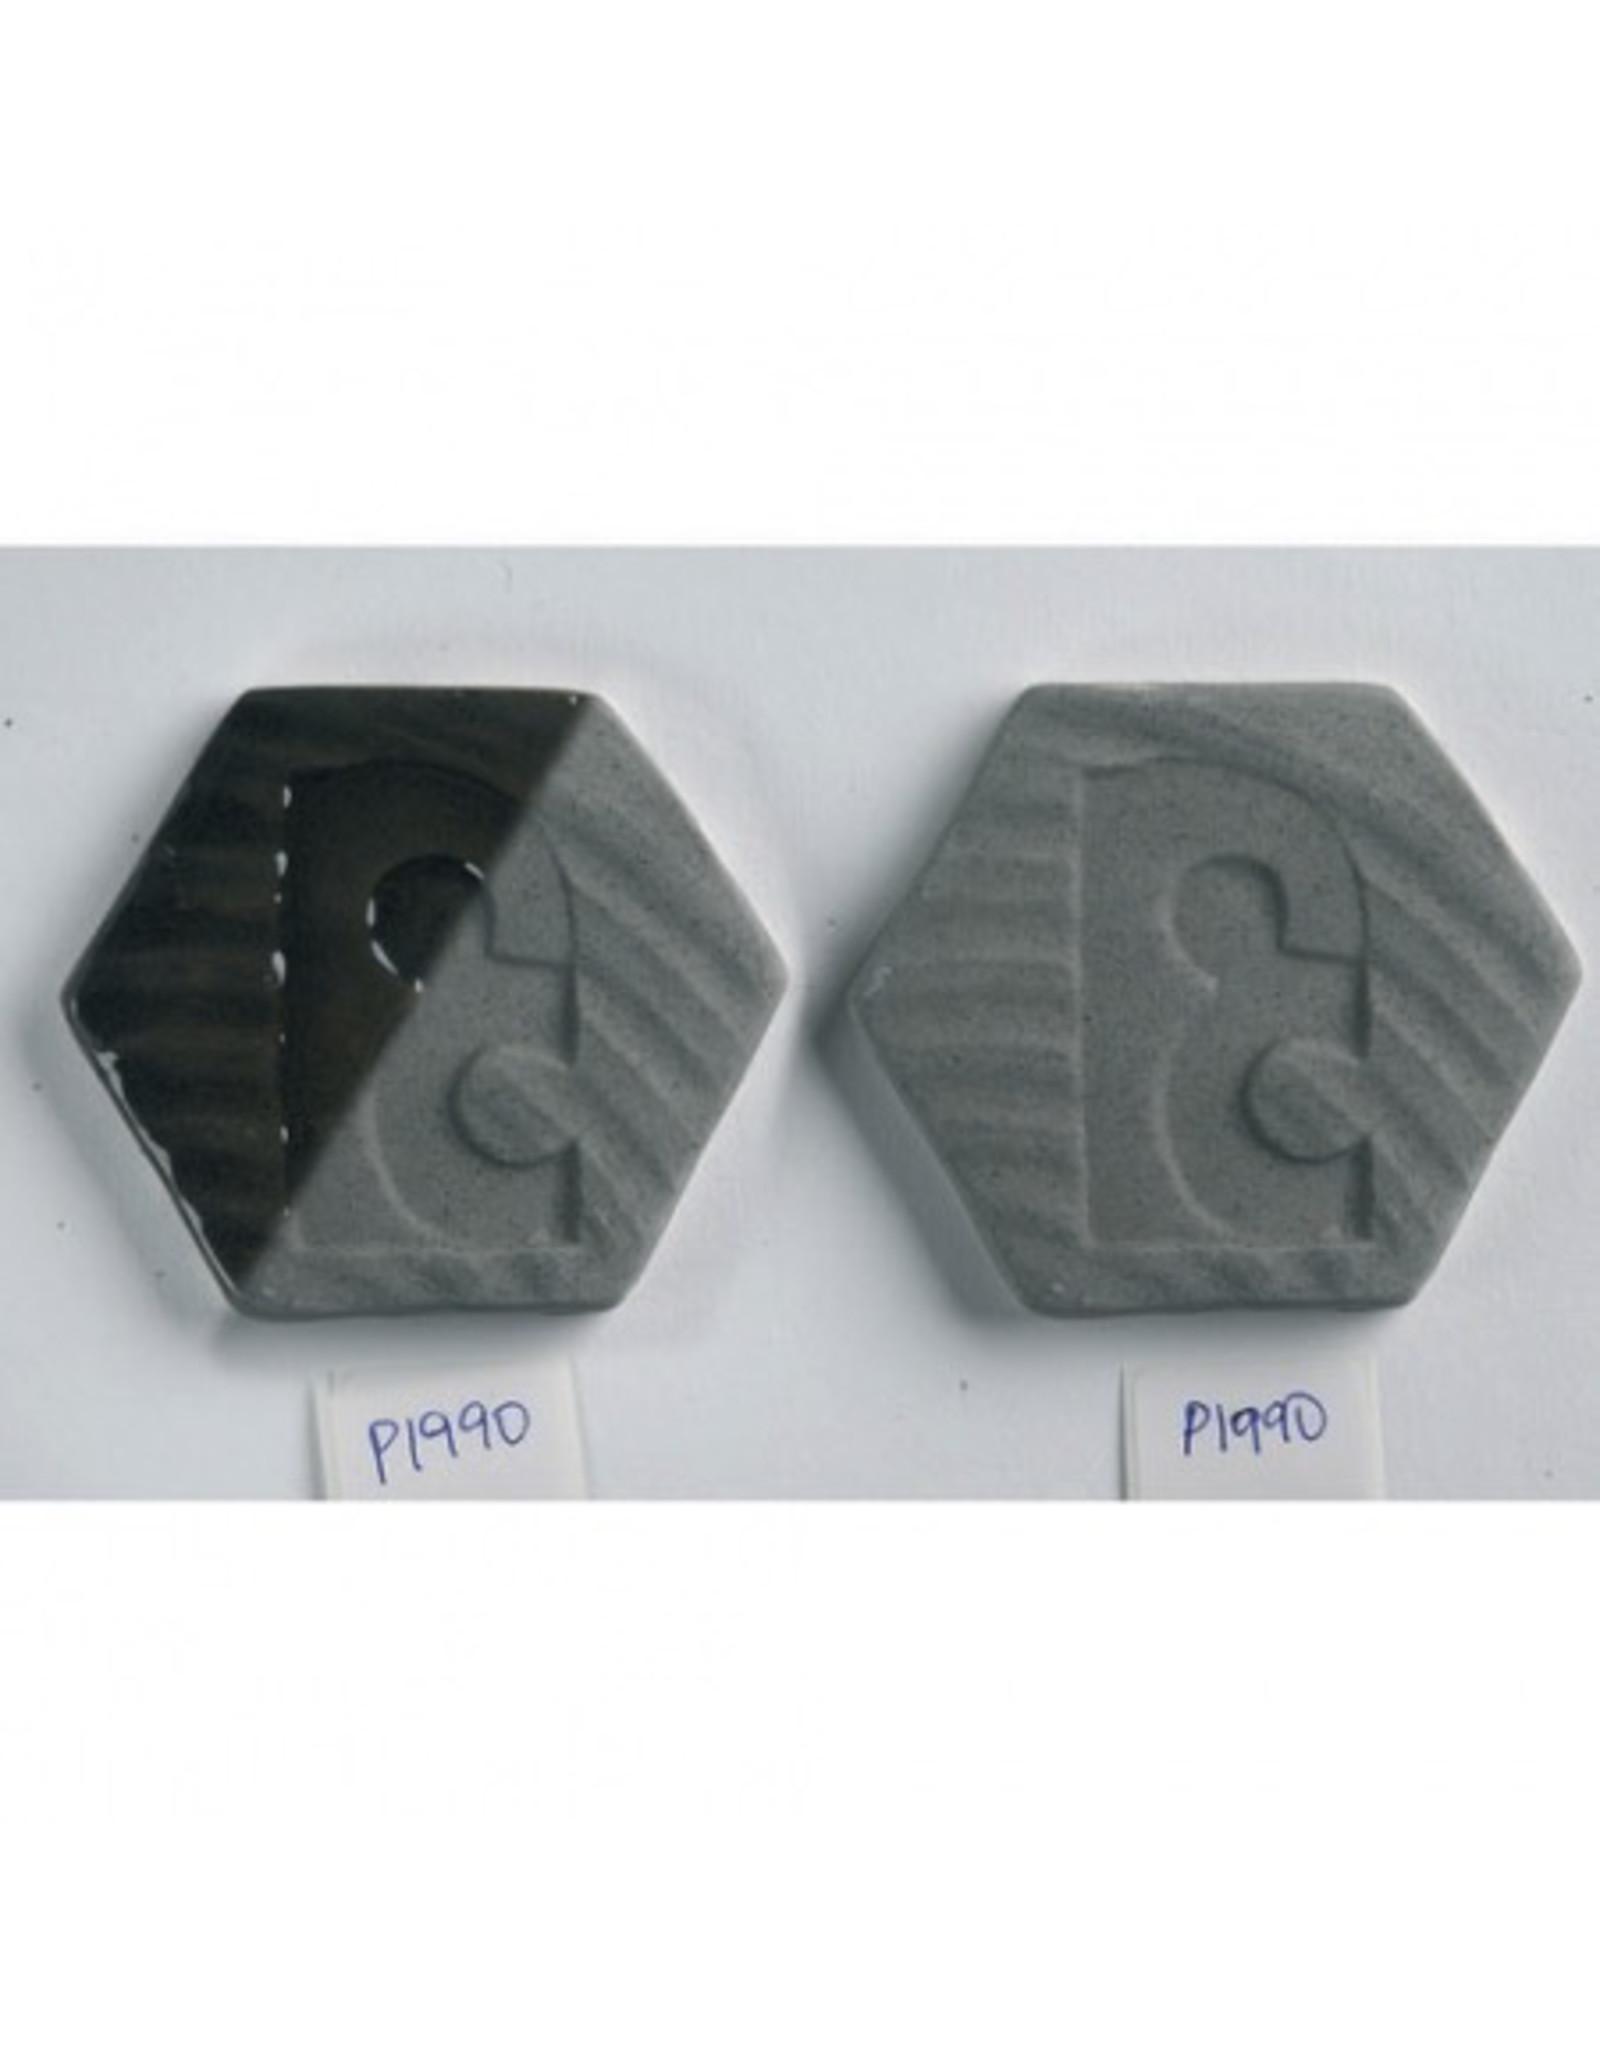 Potterycrafts Grey Powdered Decorating Slip - 1kg